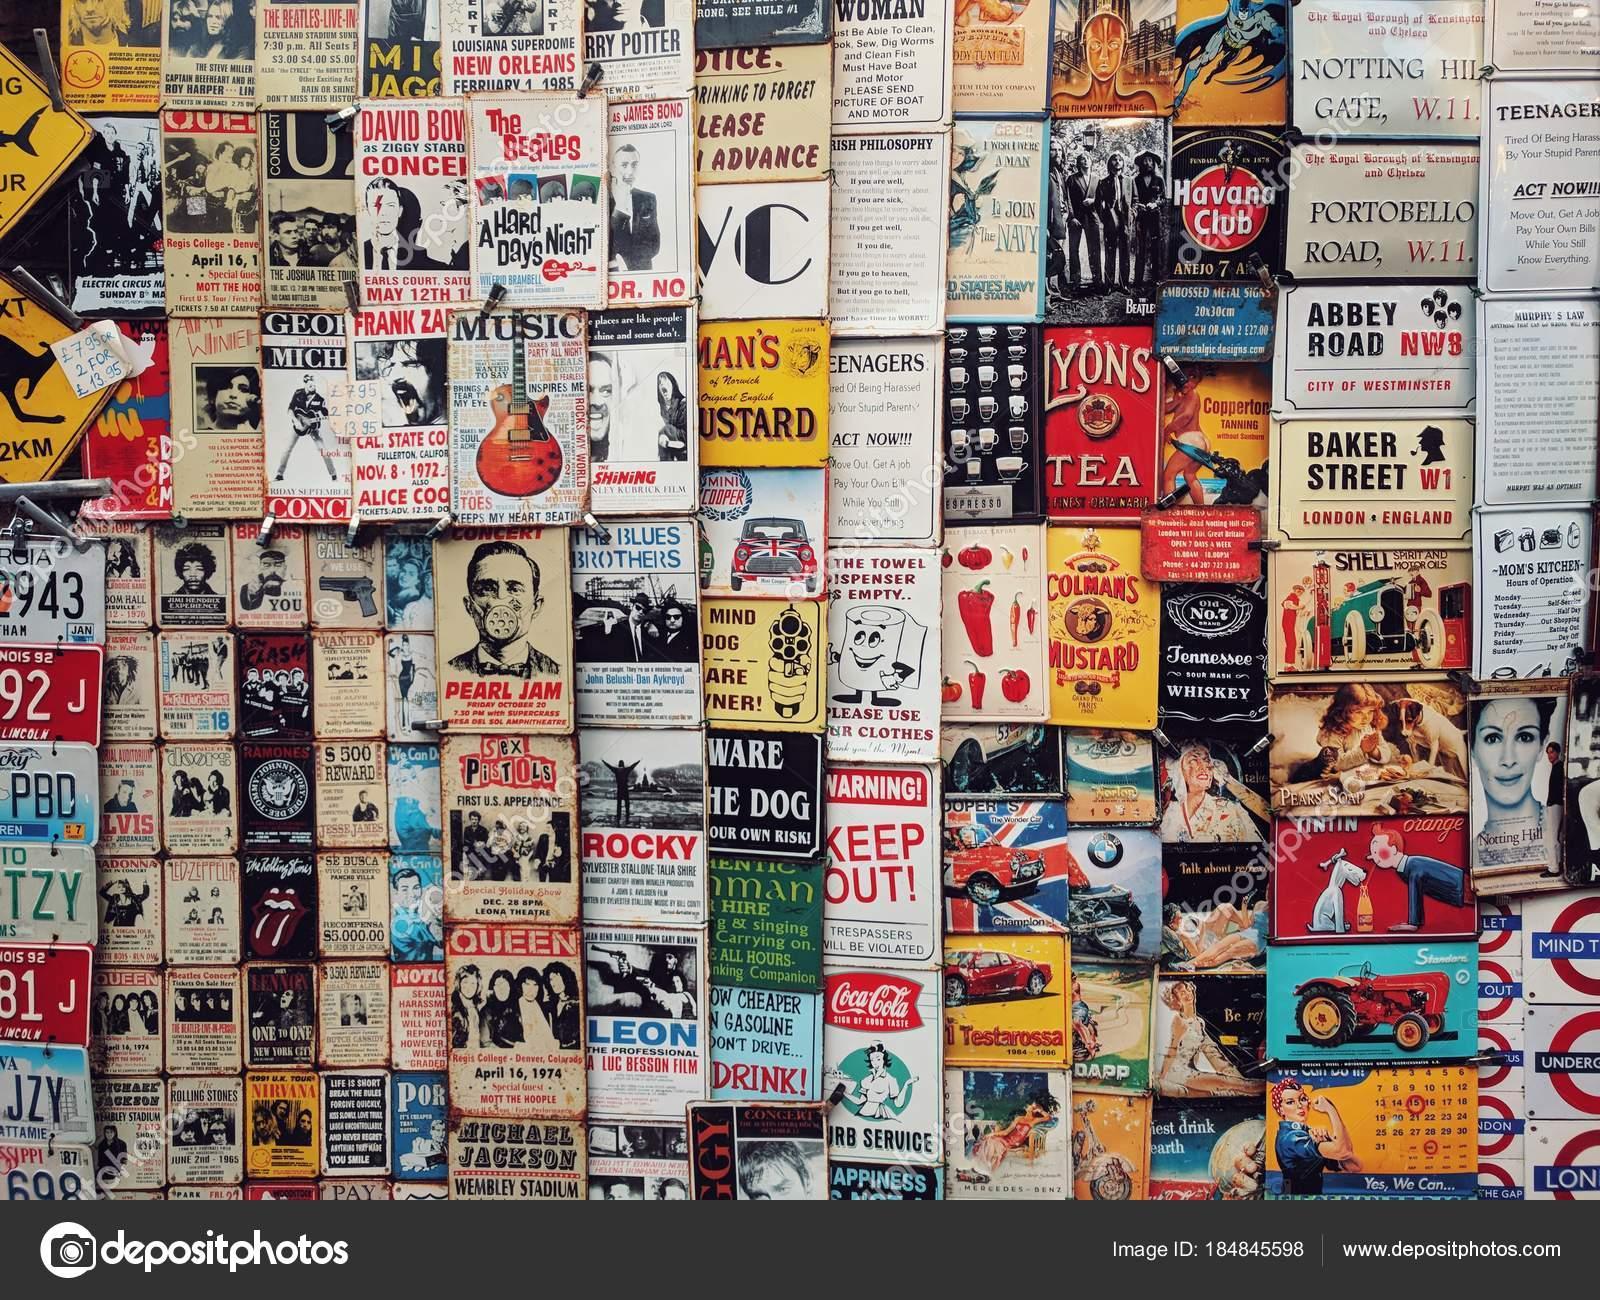 London England January 2018 Color Vintage Tin Adverts Window